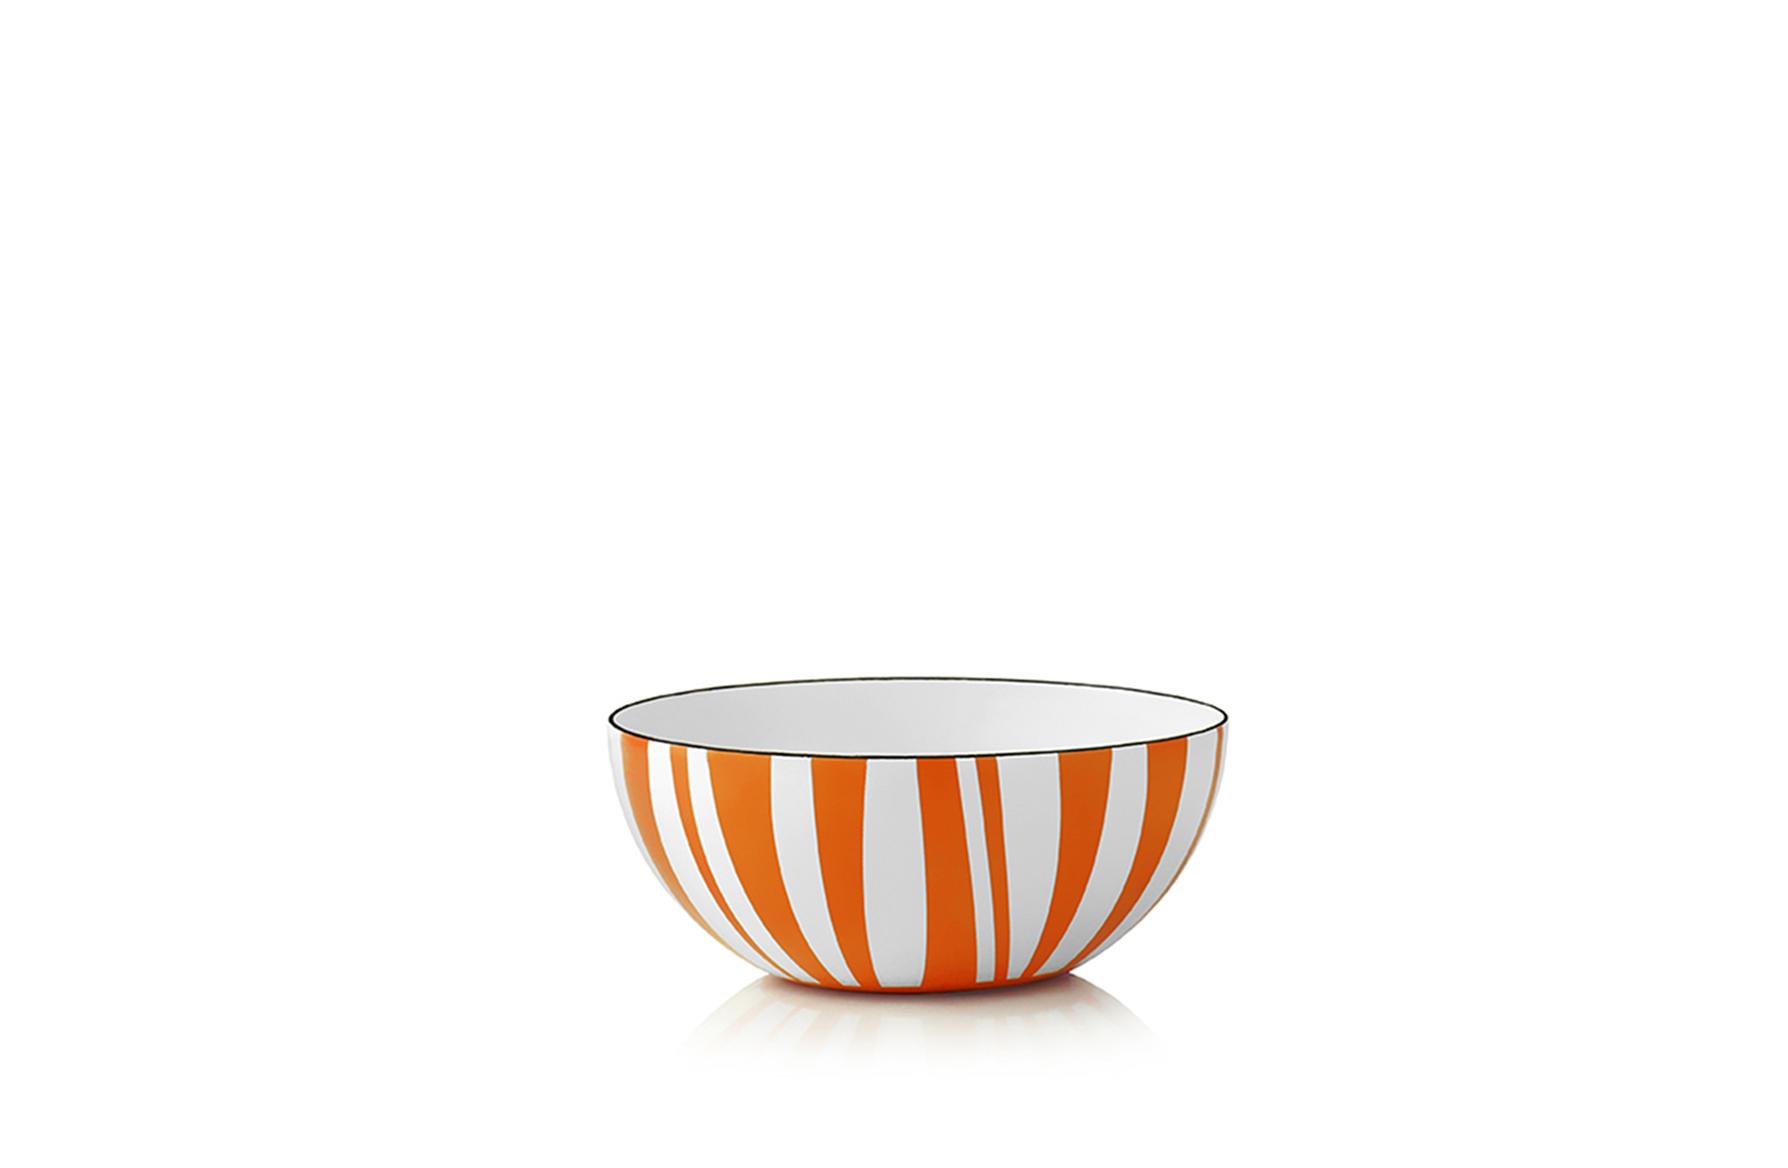 10 cm - Stripes collectionOrange